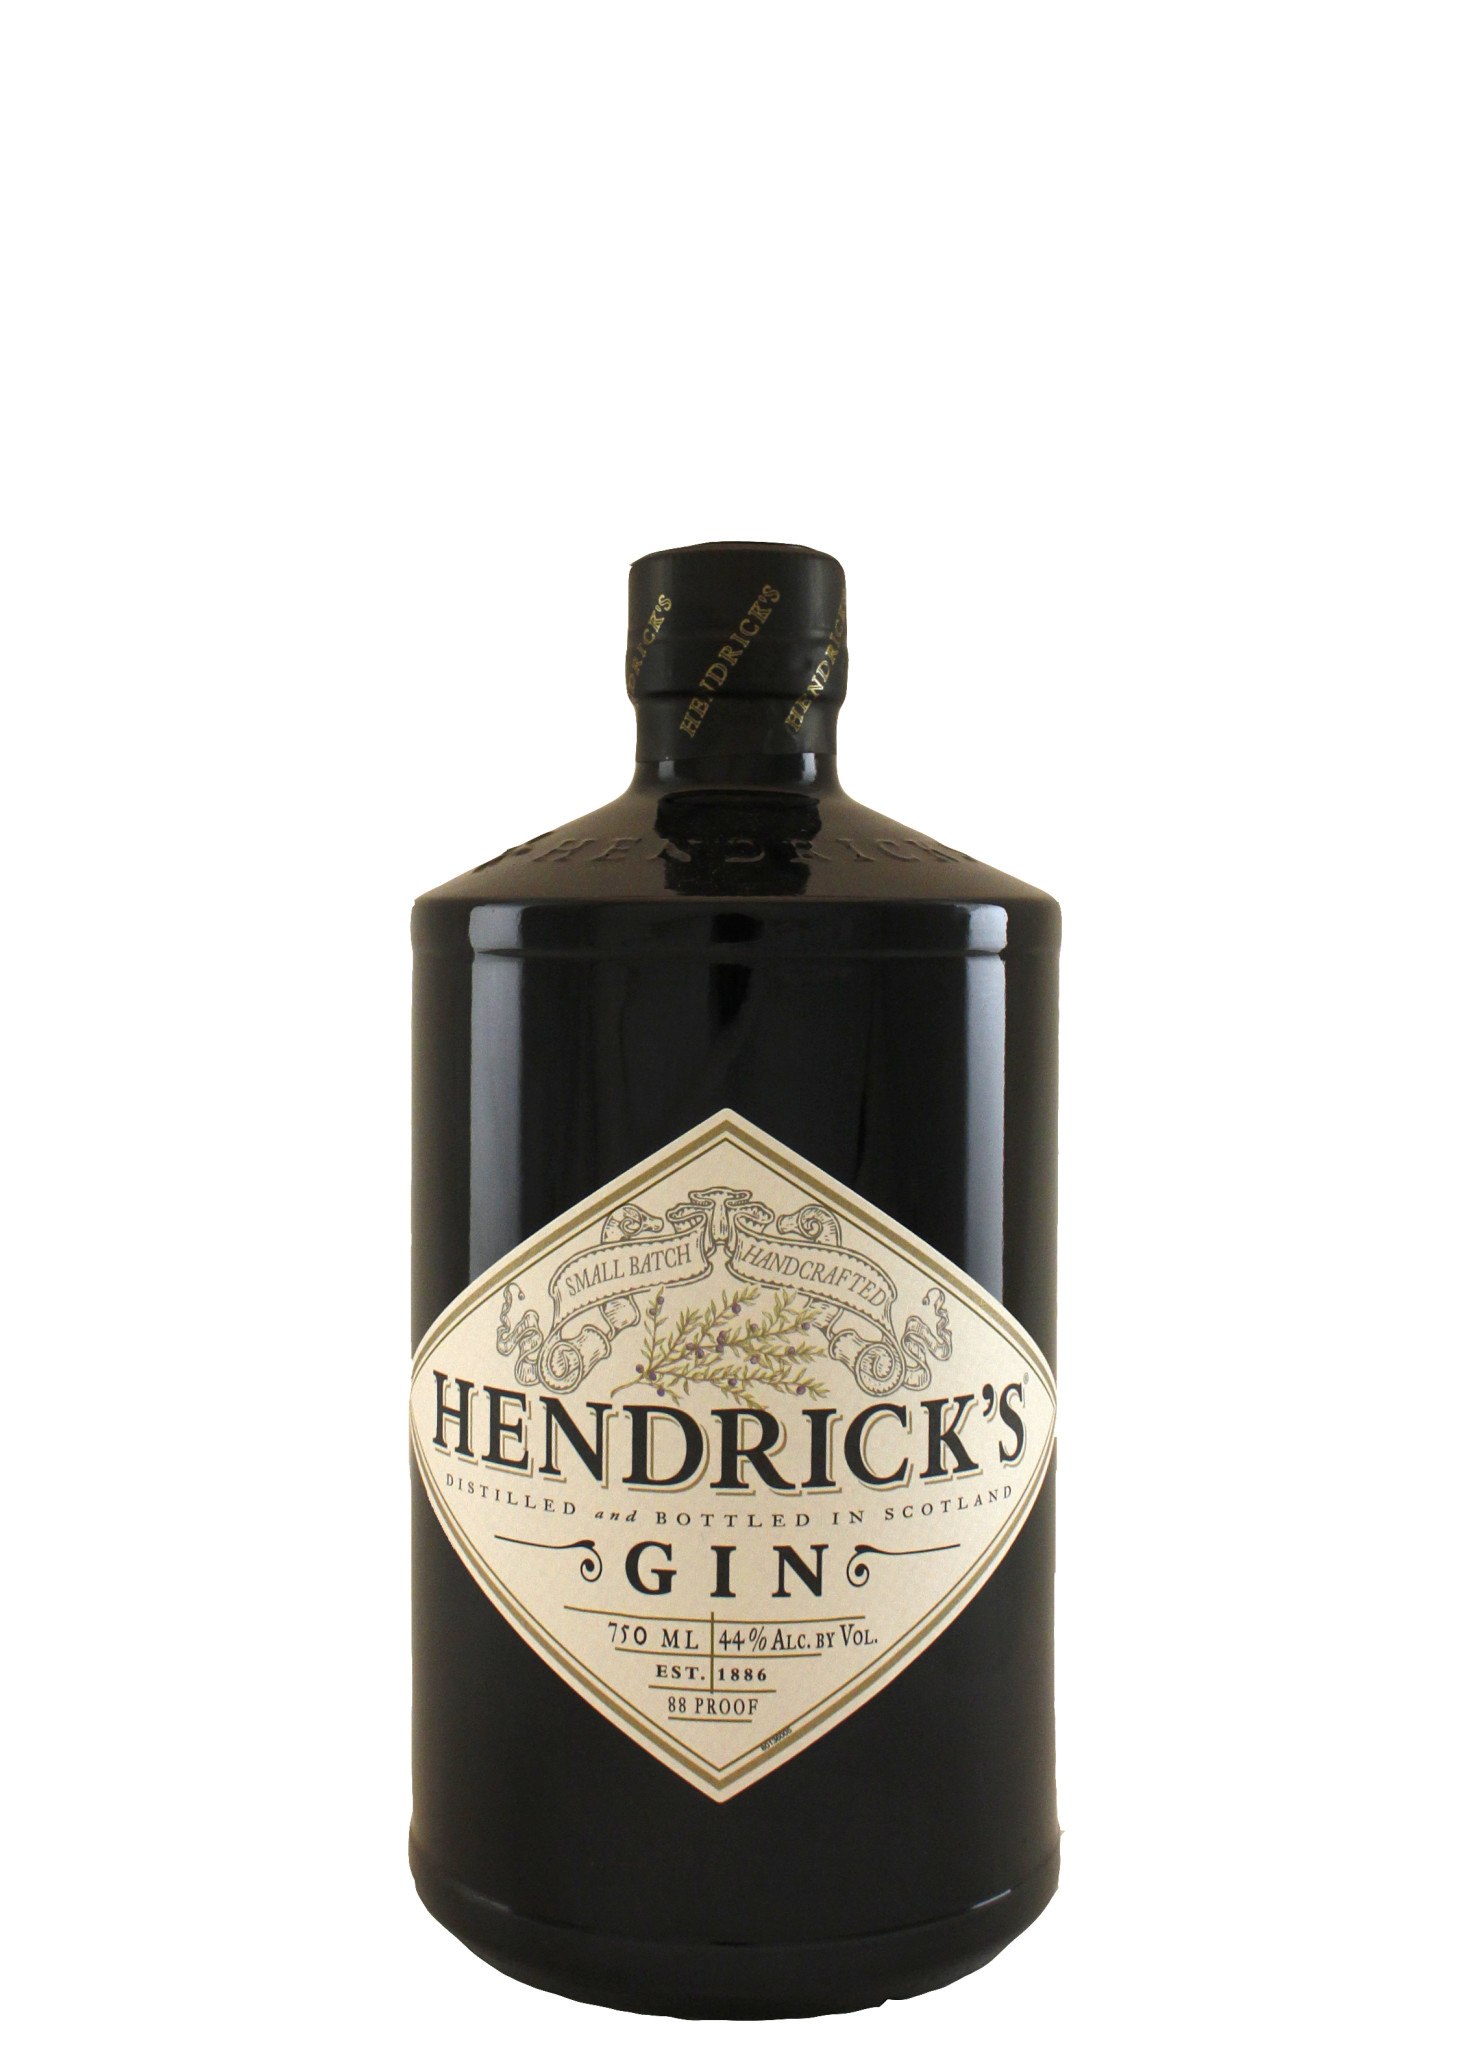 Hendrick's Small Batch Gin, Scotland